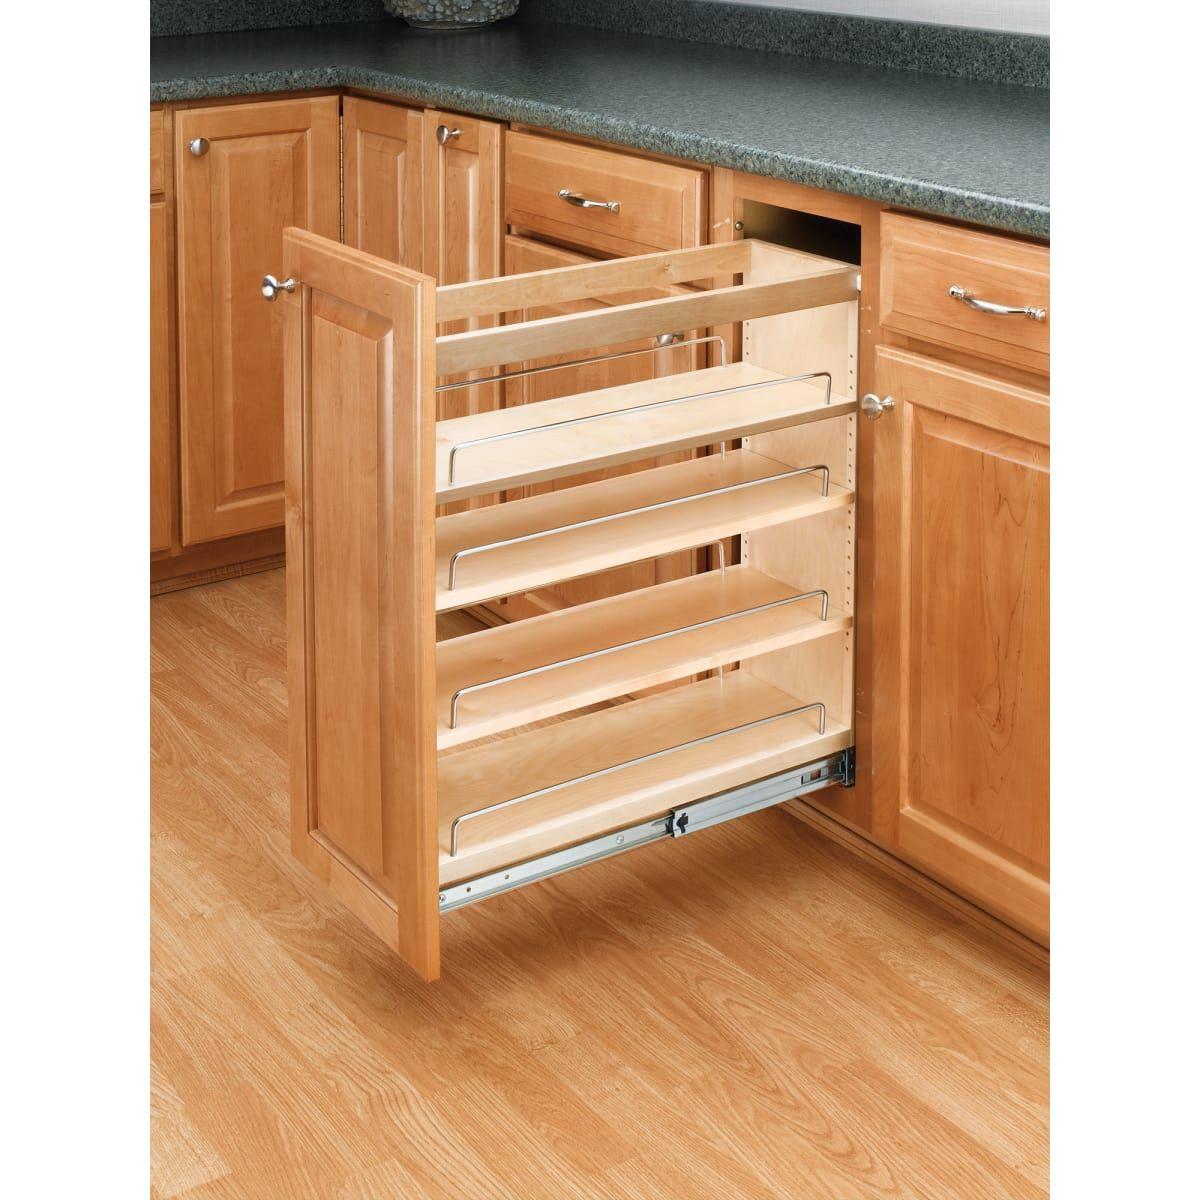 Rev A Shelf 448 Bcbbsc 8c Rev A Shelf Ikea Kitchen Cabinets